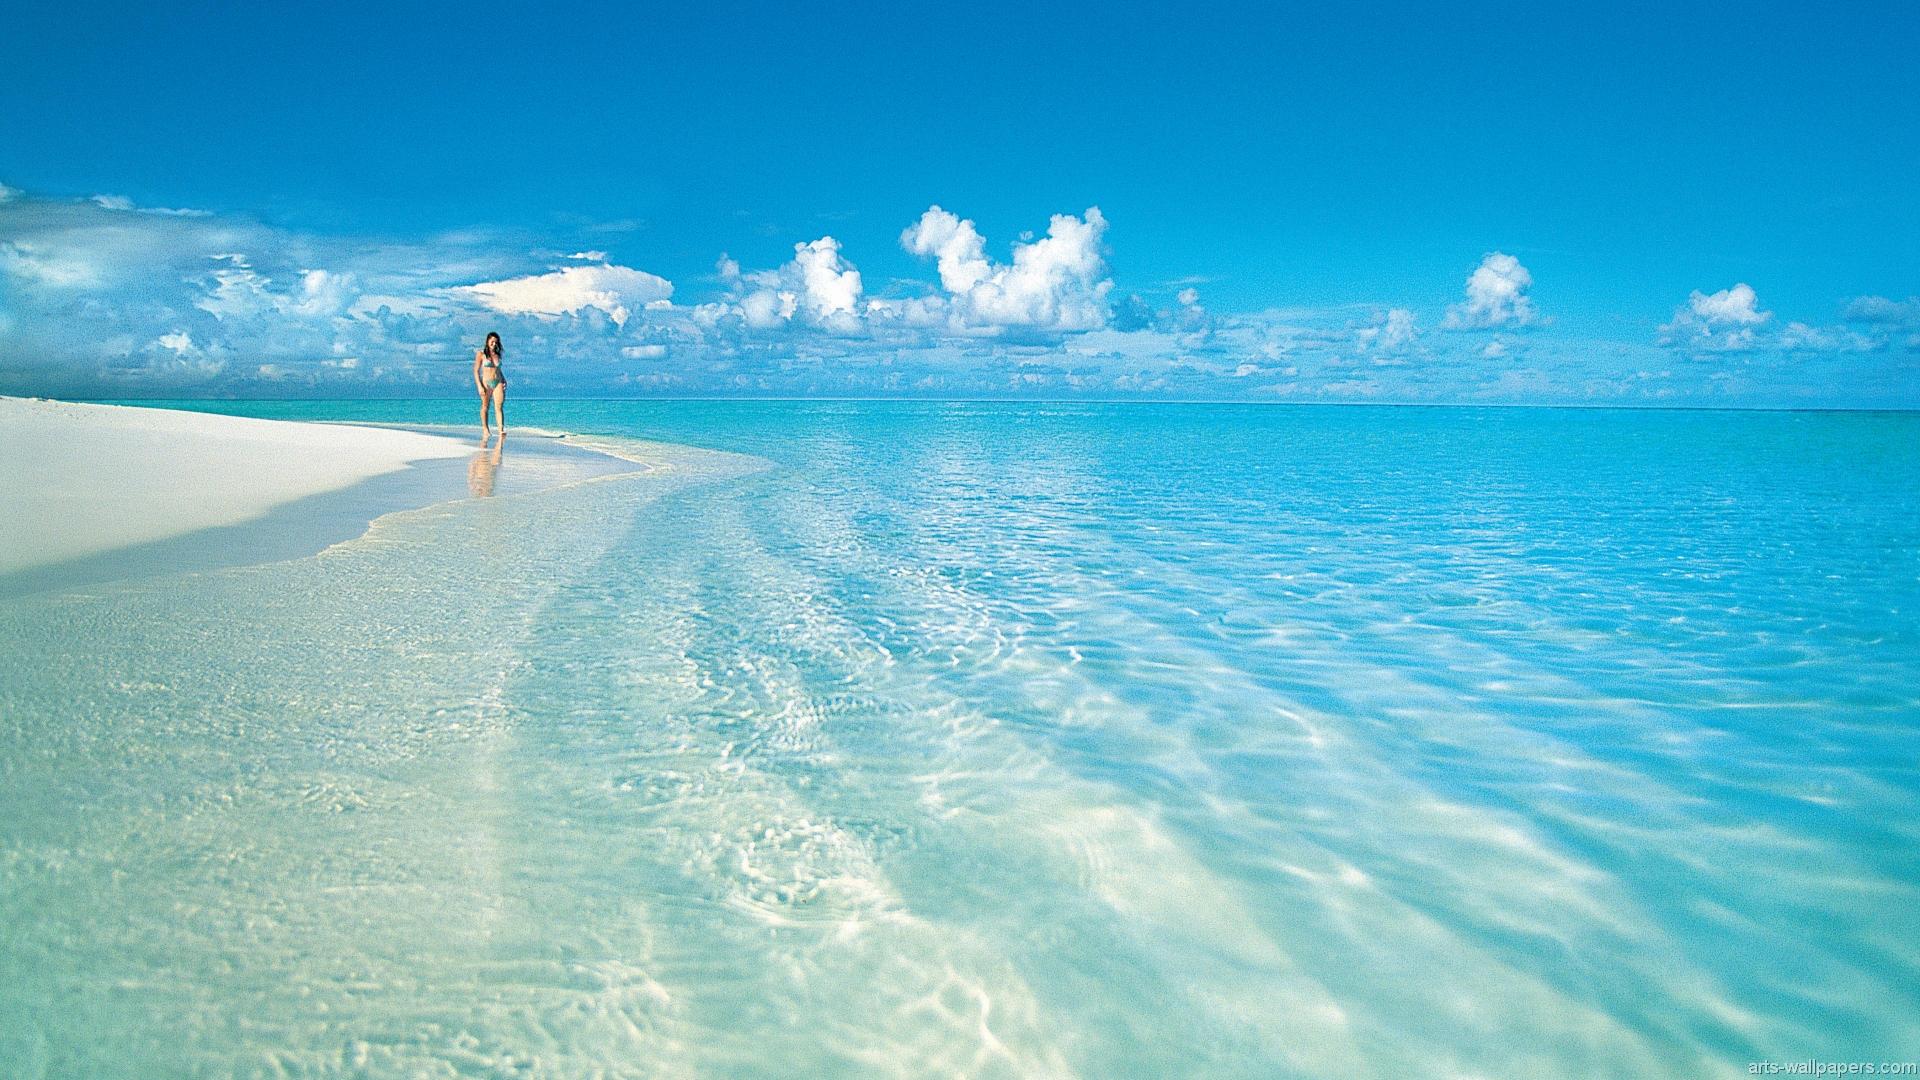 Hd Tropical Island Beach Paradise Wallpapers And Backgrounds: Tahiti Beach Wallpaper